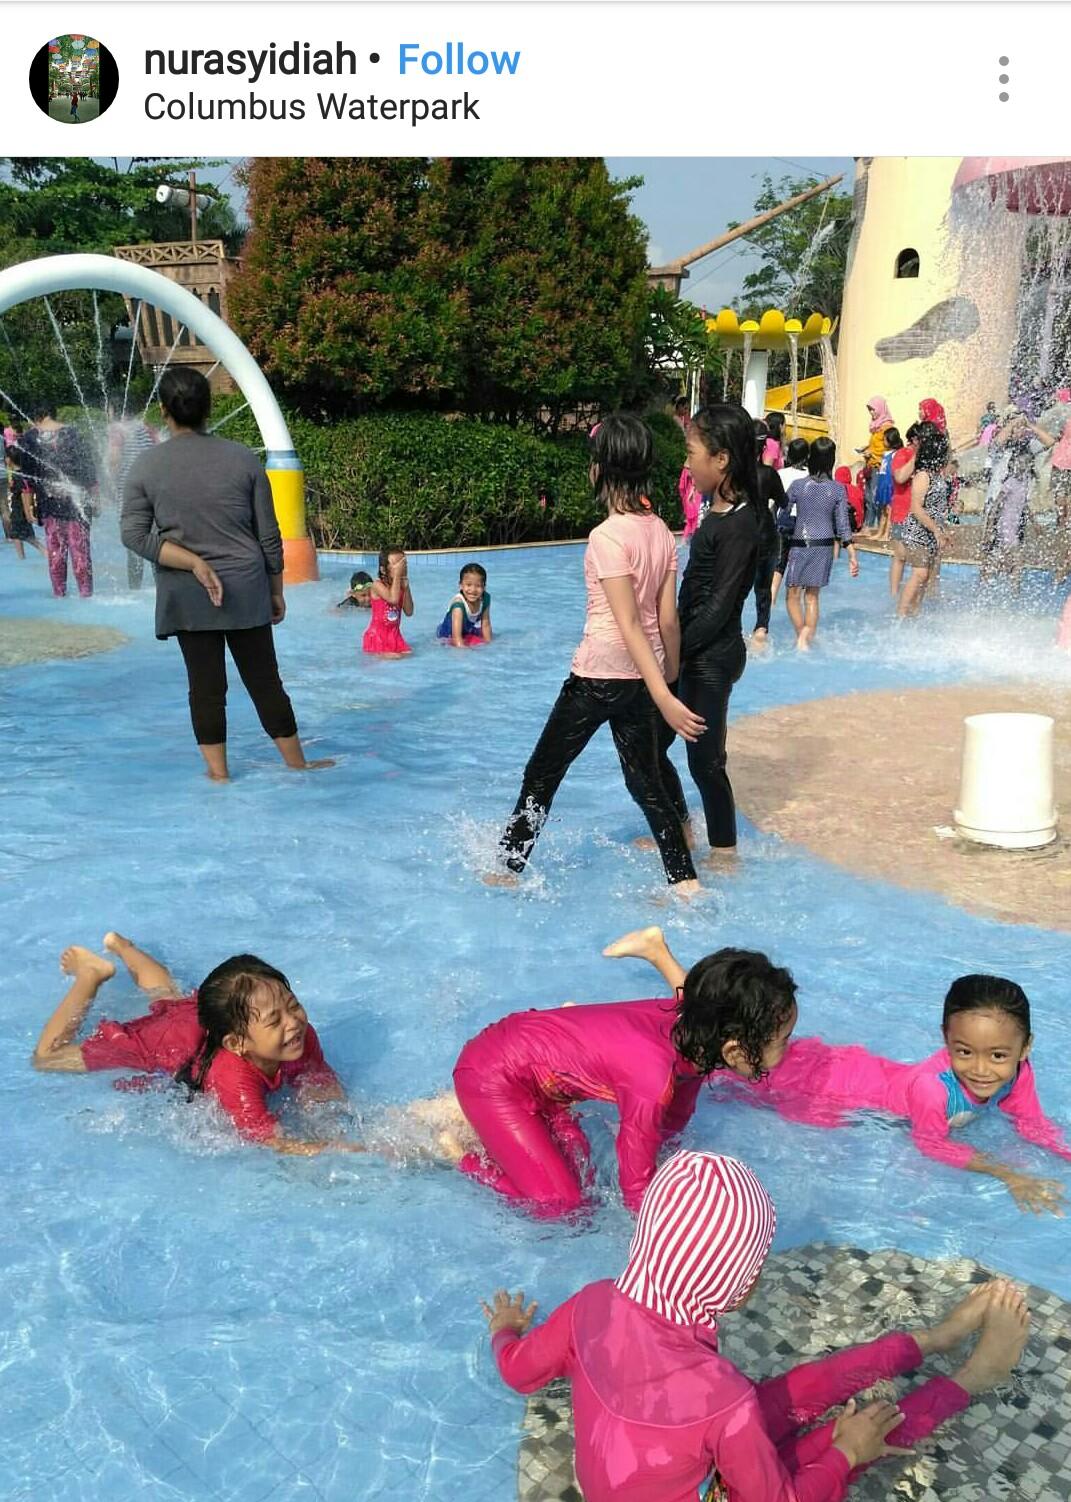 Columbus Waterpark Kids Holiday Spots Liburan Anak Informasi Voucher Tiket Bekasi Liburananak Columbuswaterpark